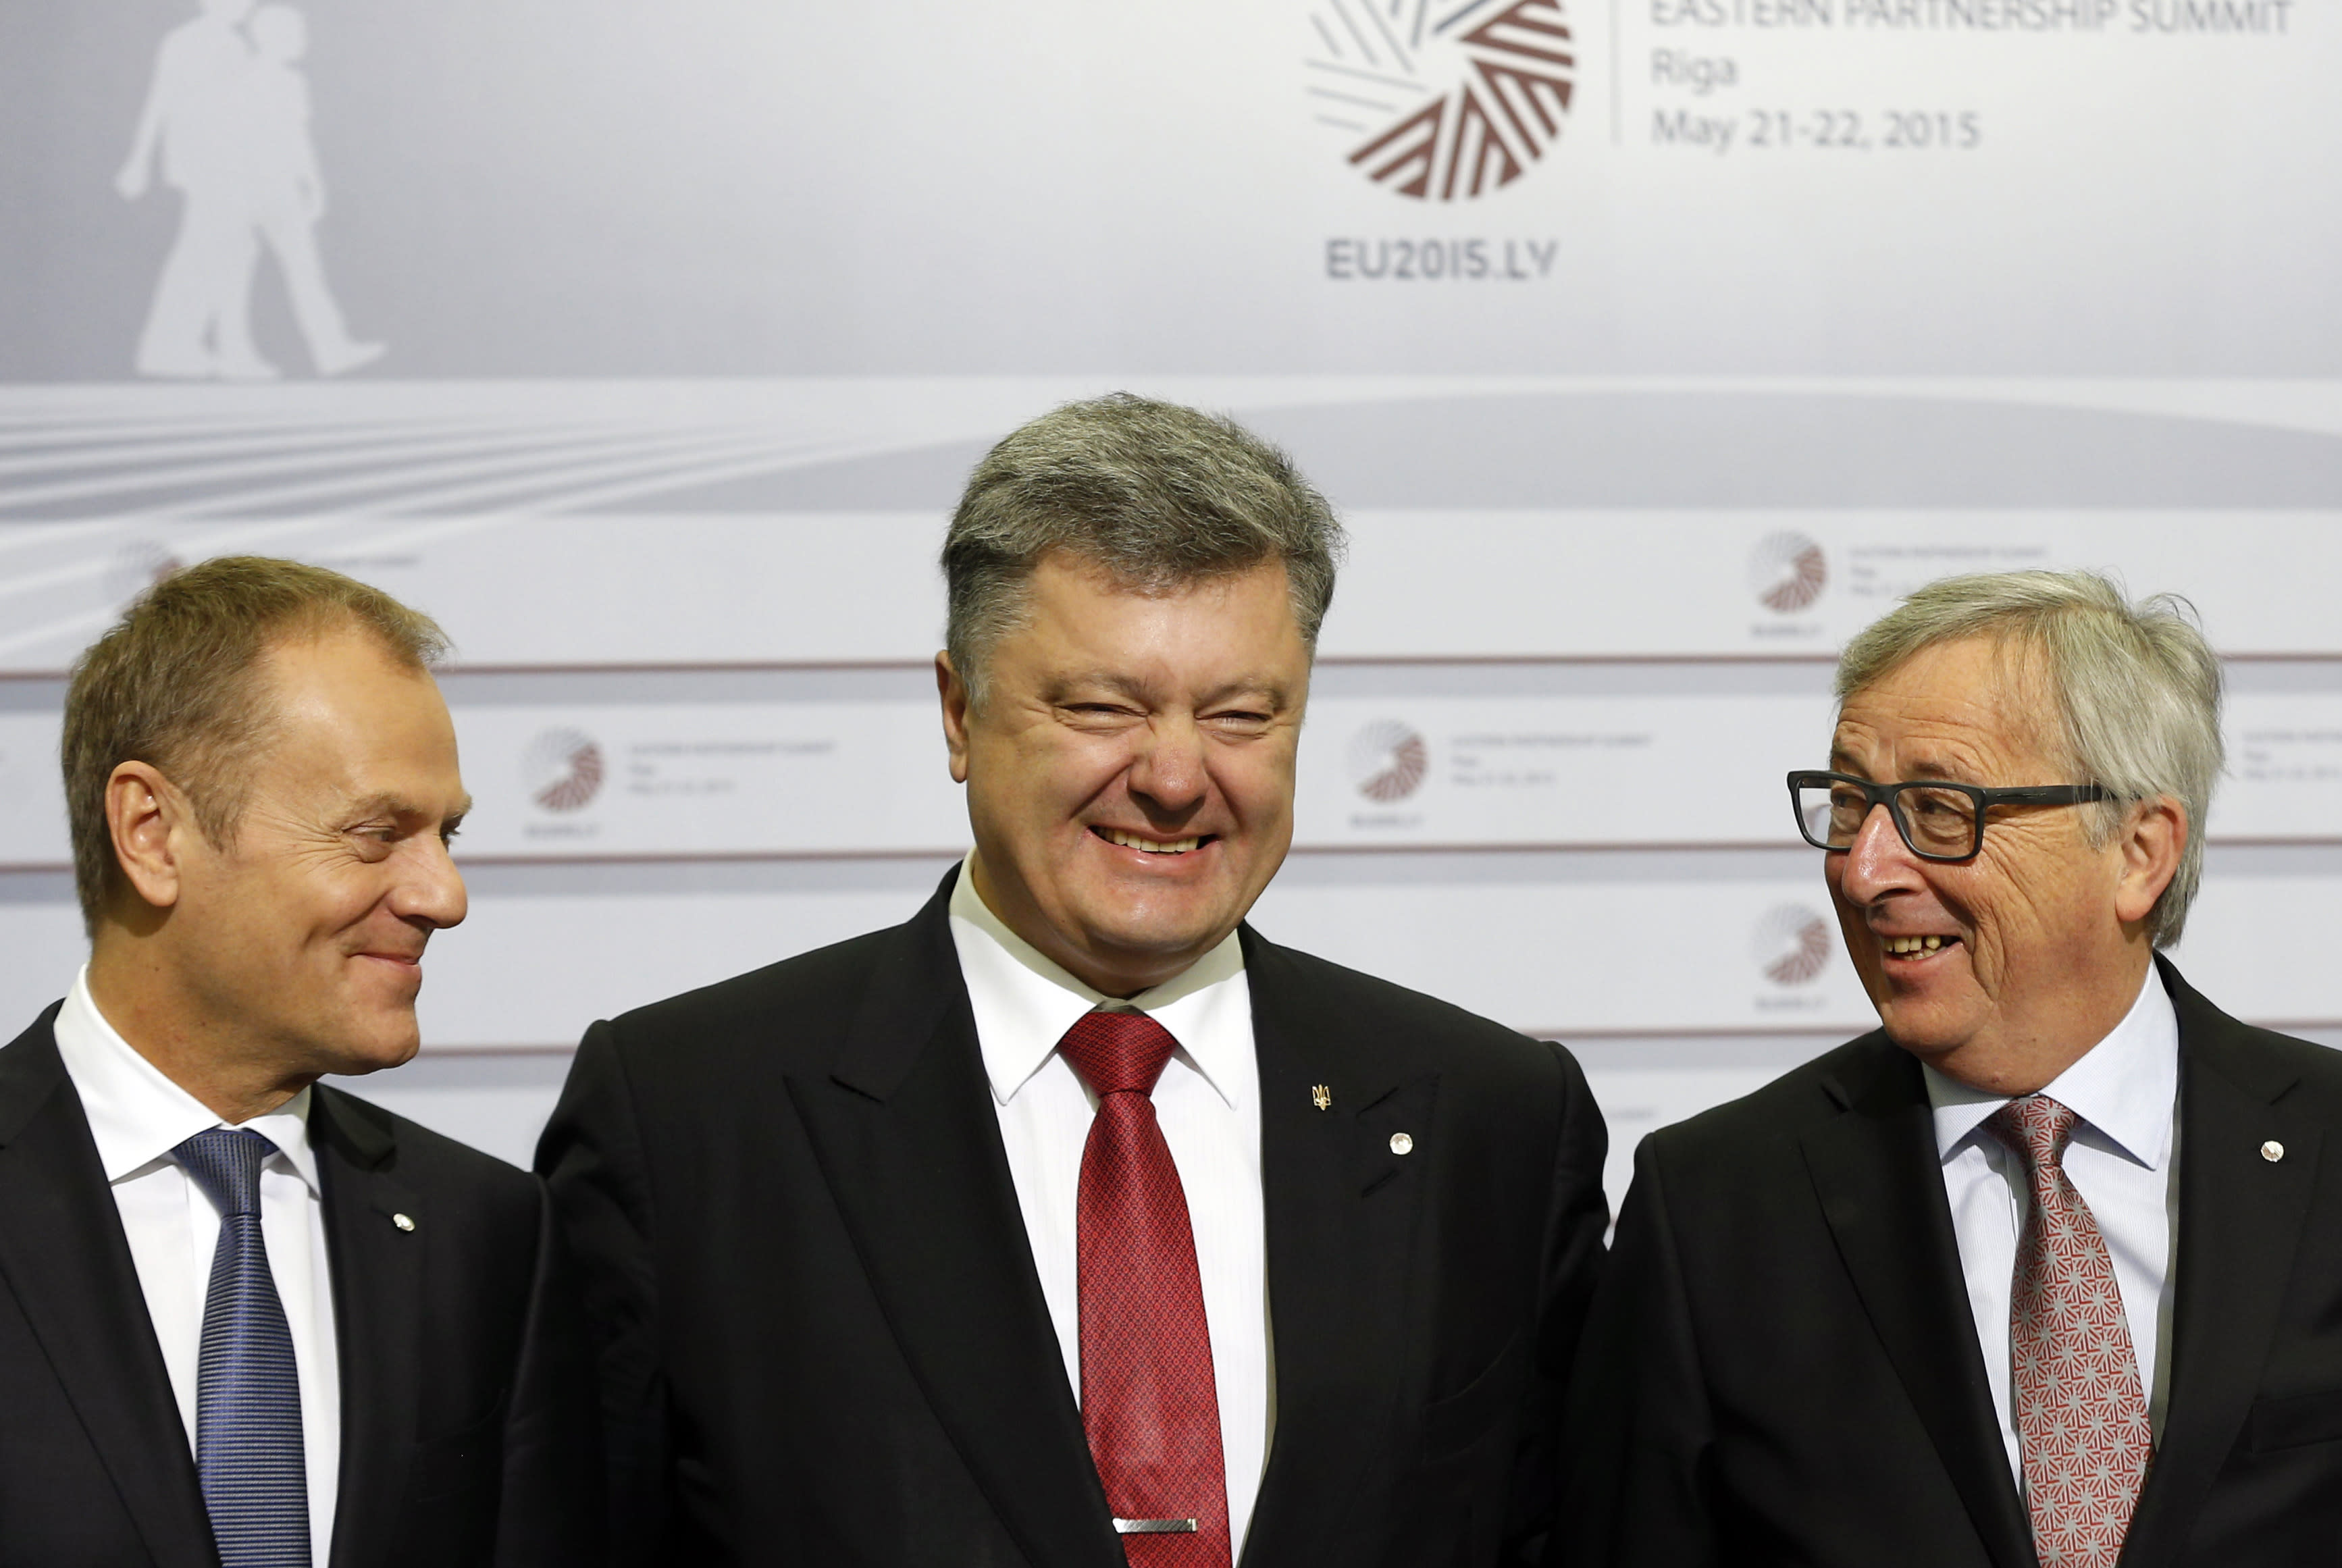 EU, Ukraine sign $2 billion loan deal at Eastern summit